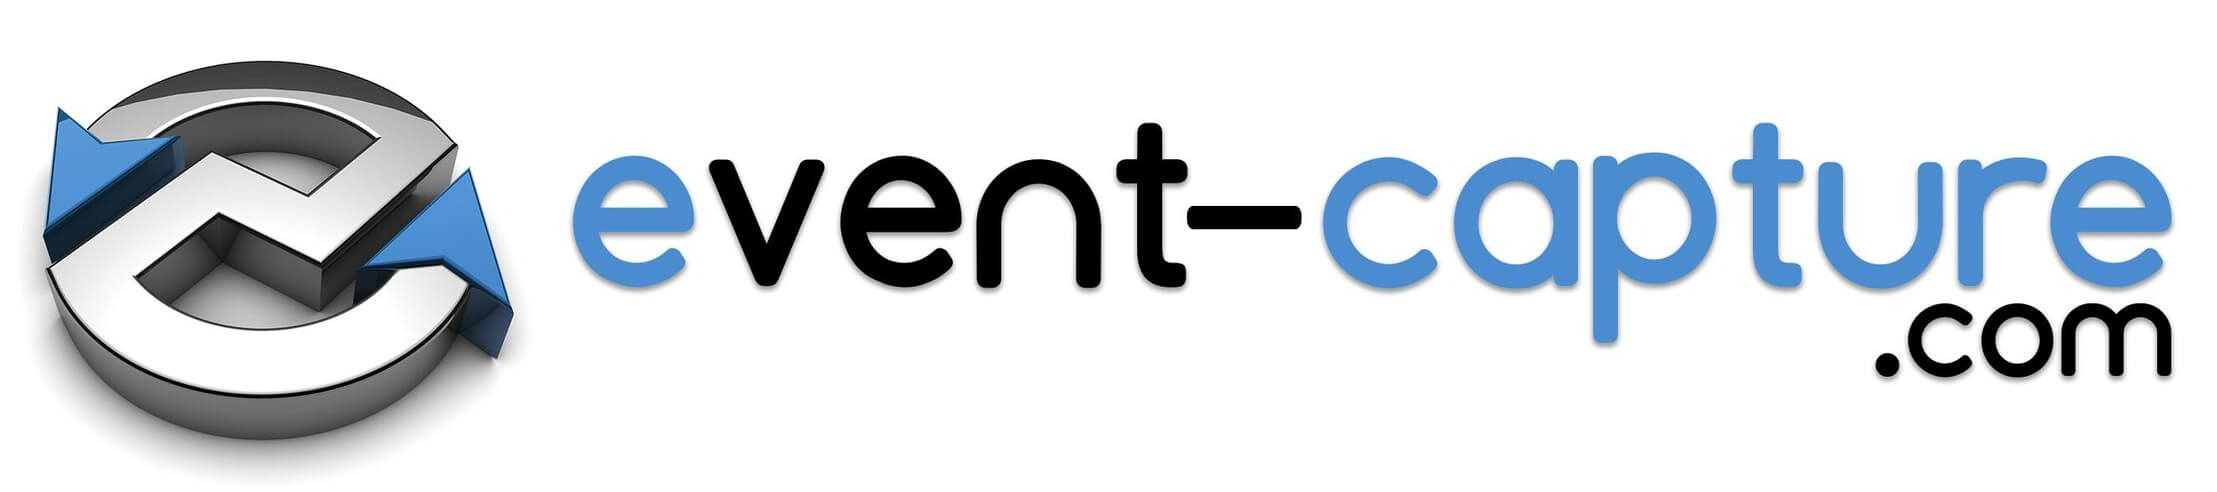 event_capture_logo_1.jpg